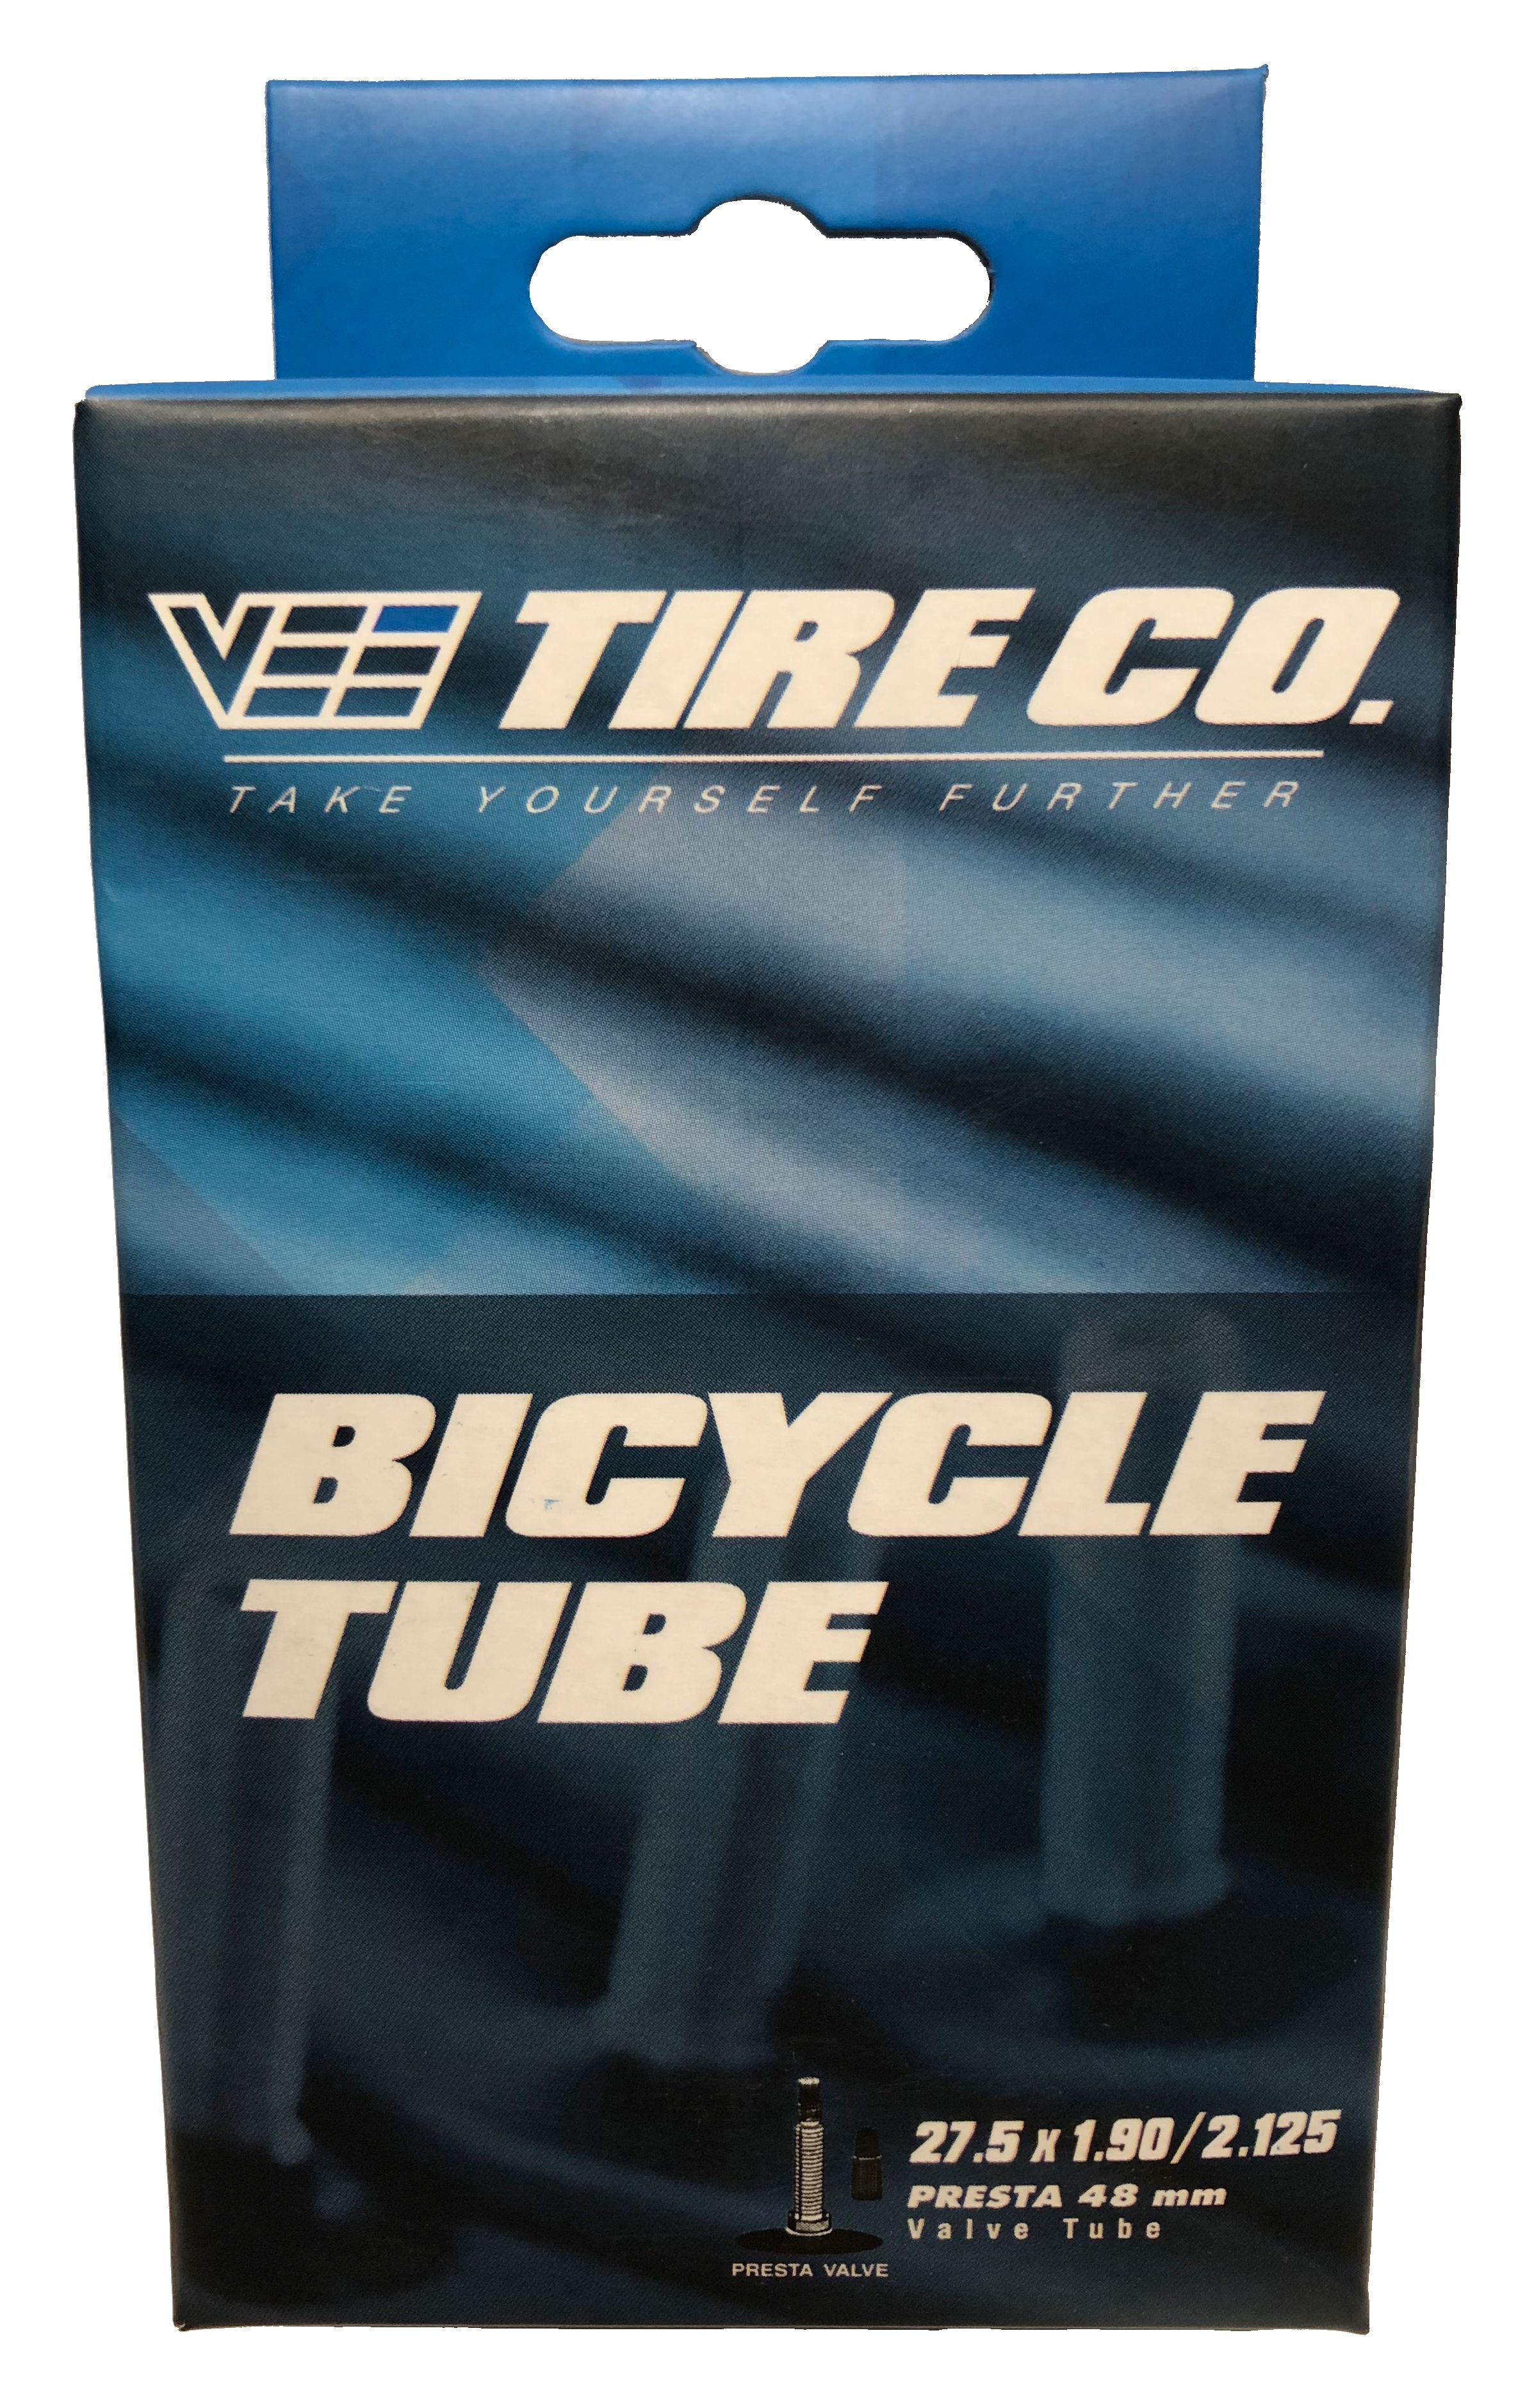 Two 27.5x2.50 Vee Tire Bike Tire Bicycle Inner Tubes 48mm Presta Valve 27.5X2.5